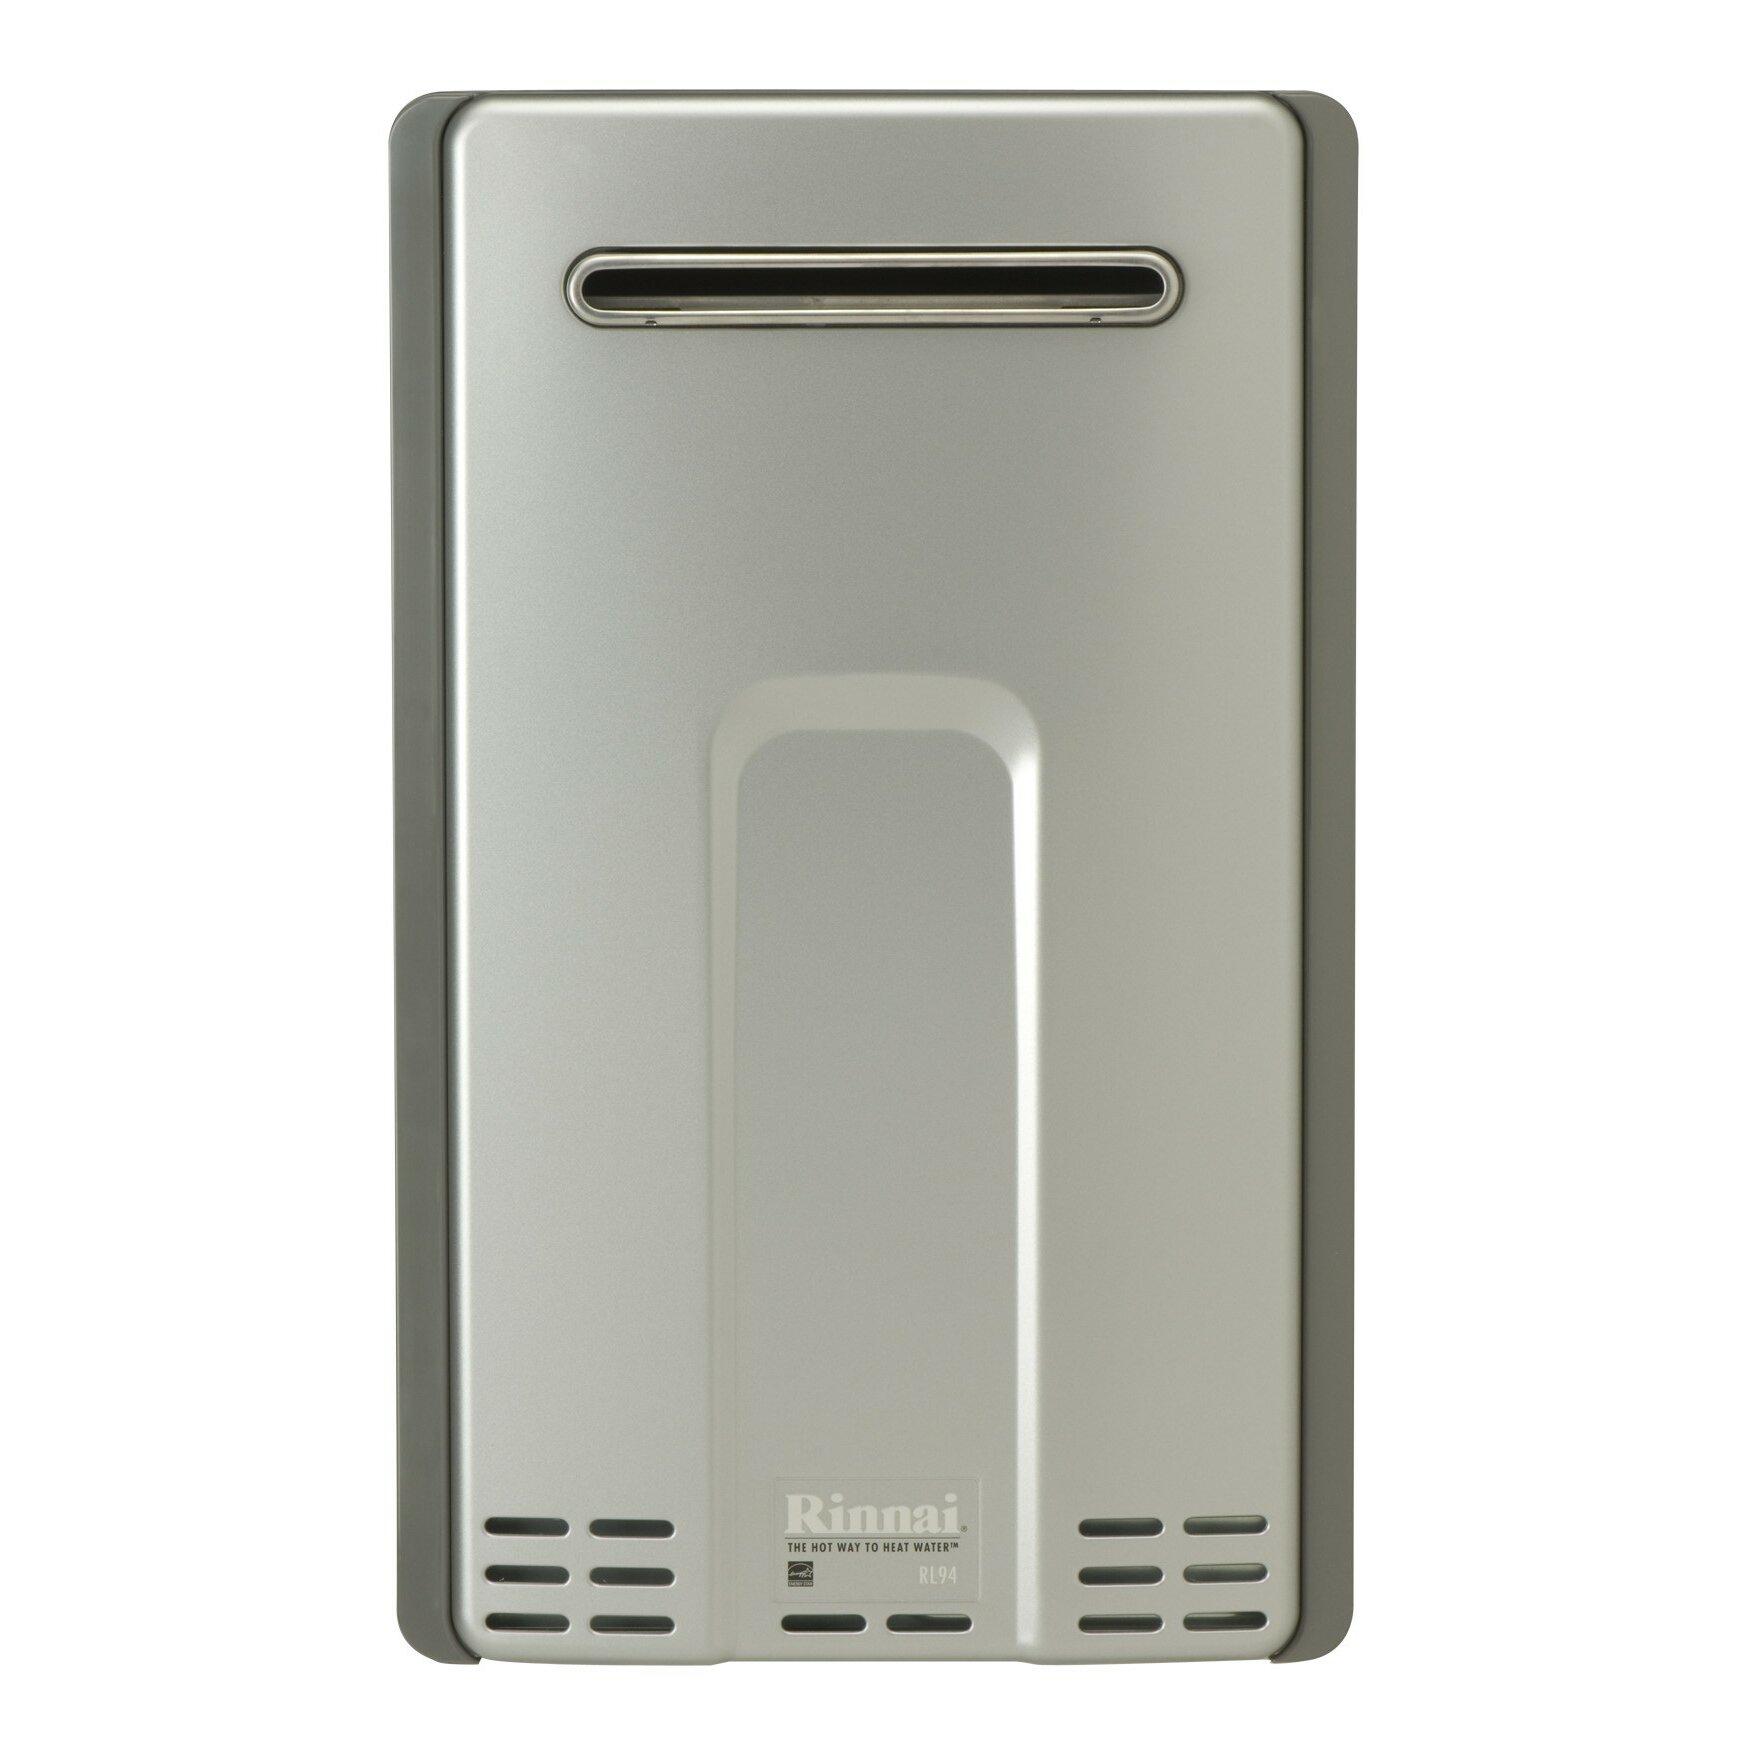 rinnai luxury 9 4 gpm liquid nature gas tankless water heater reviews wayfair. Black Bedroom Furniture Sets. Home Design Ideas